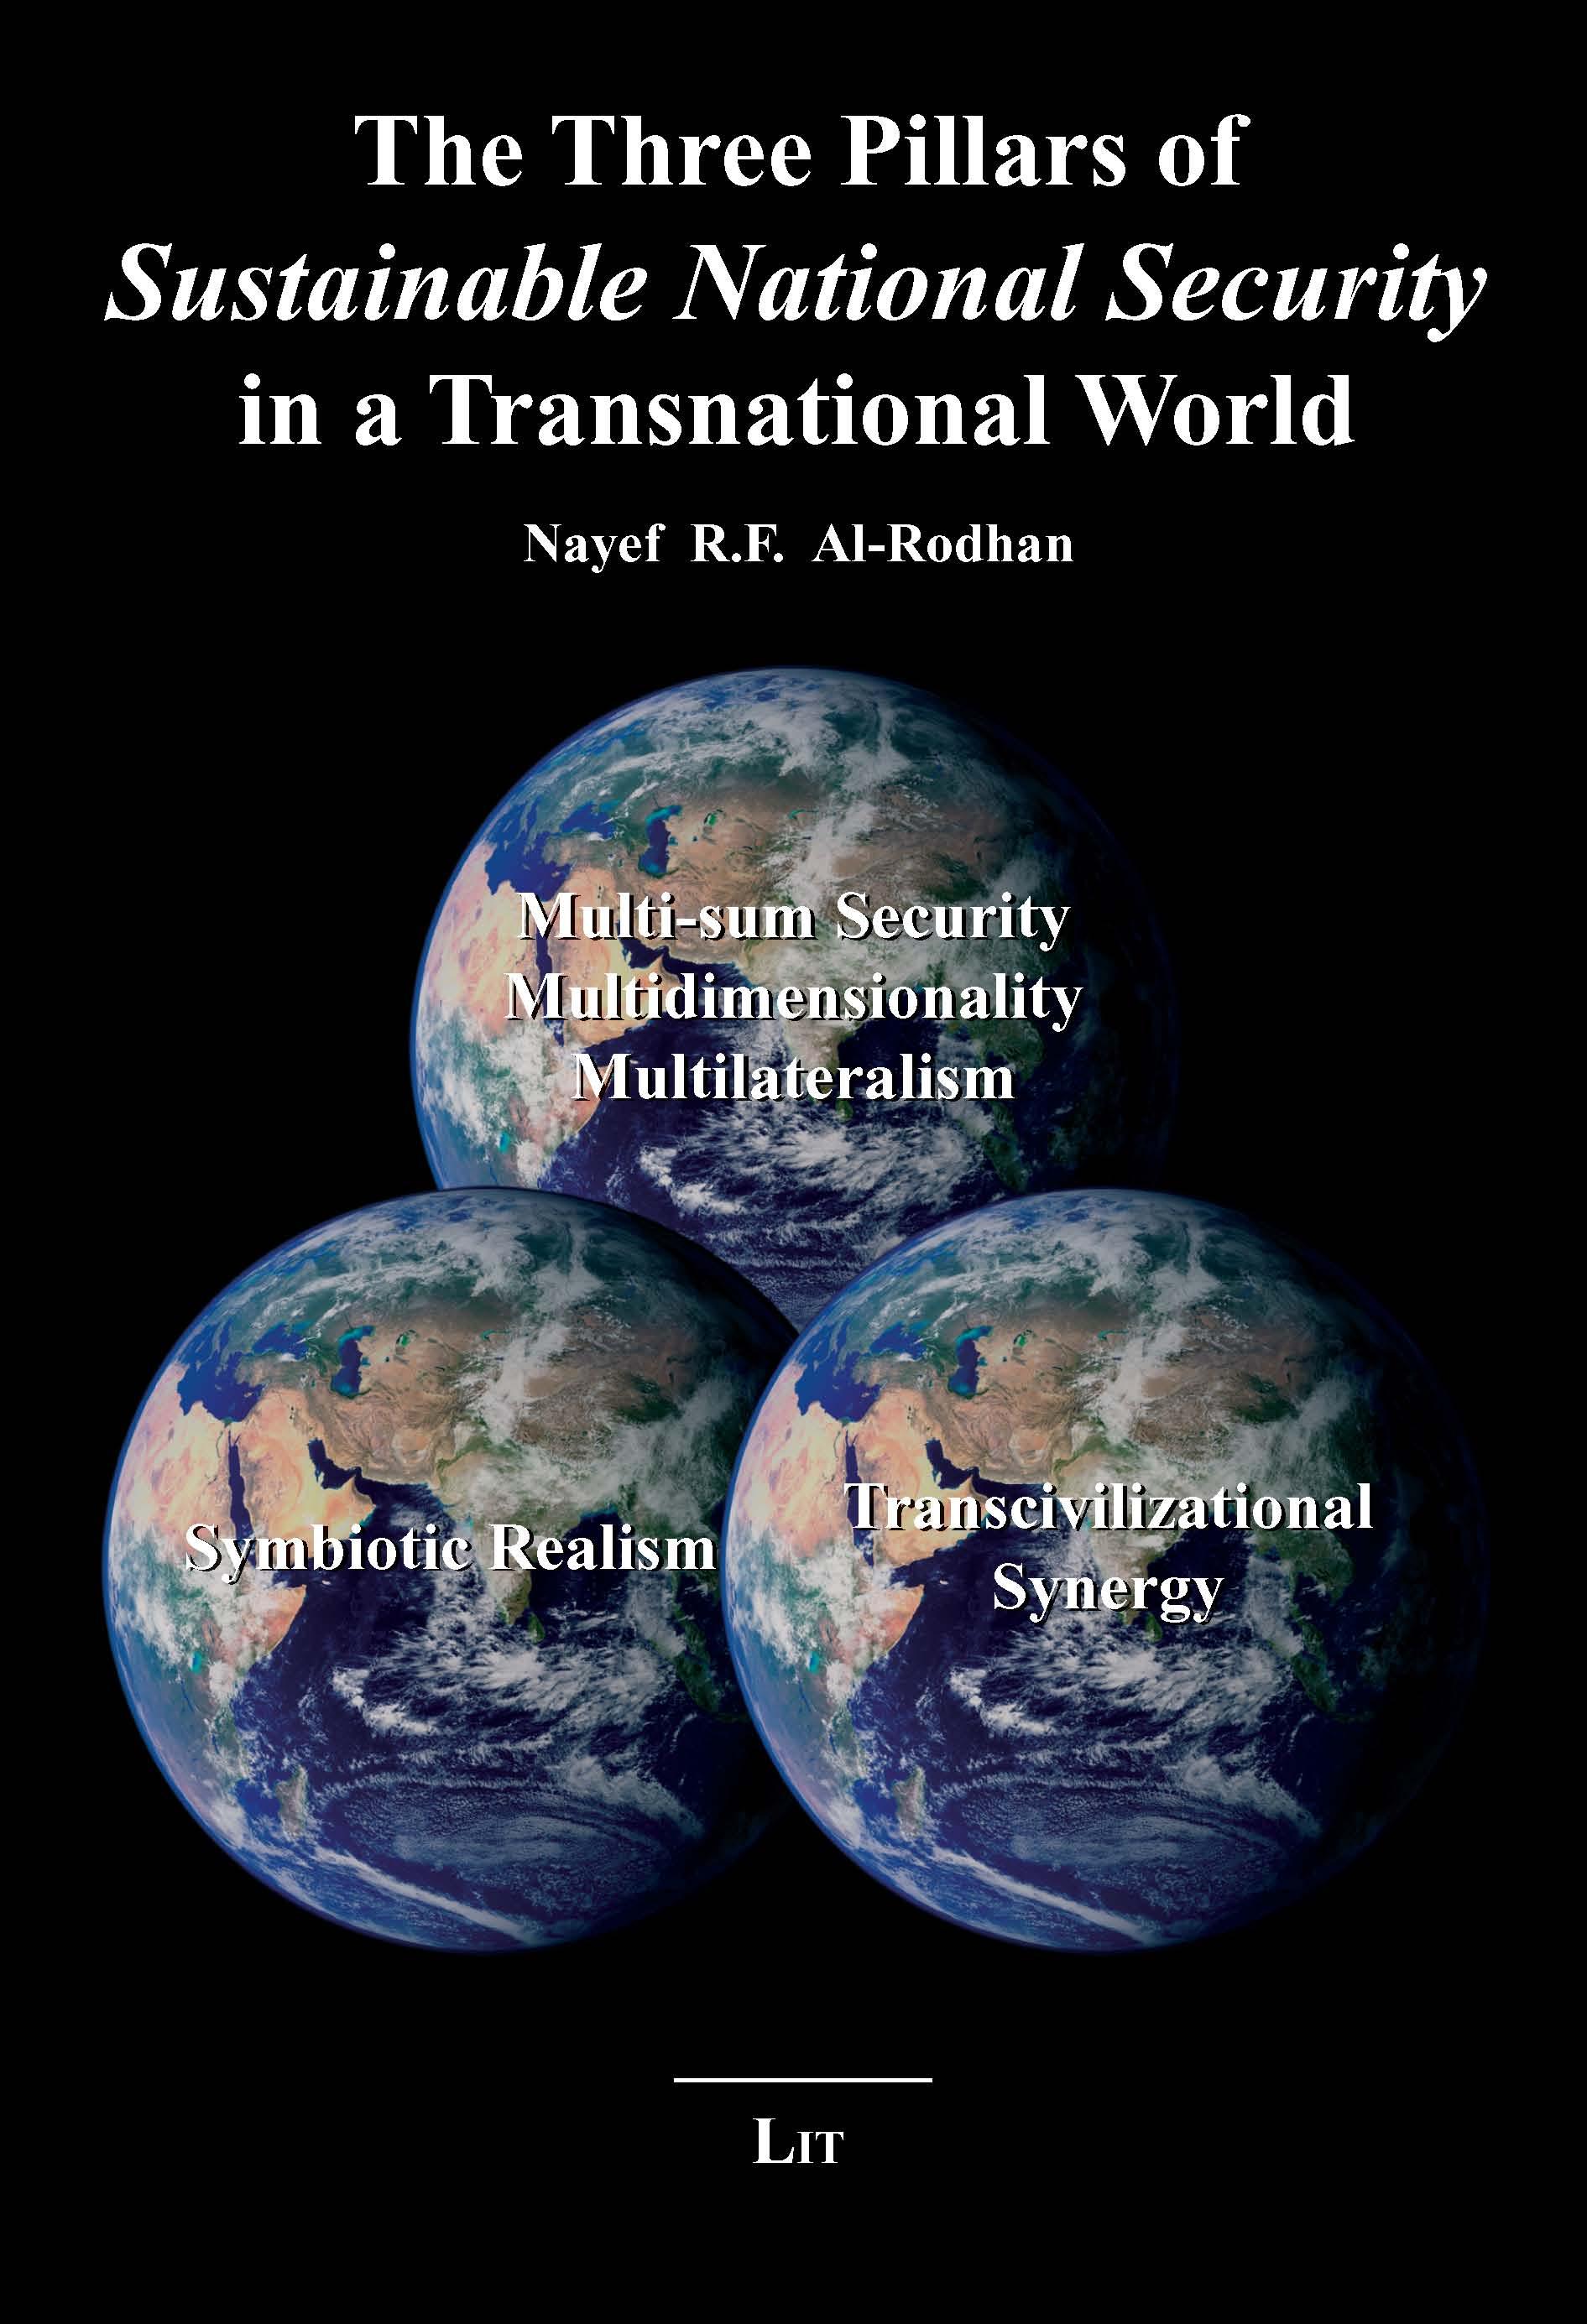 Three Pillars of National Security.jpg